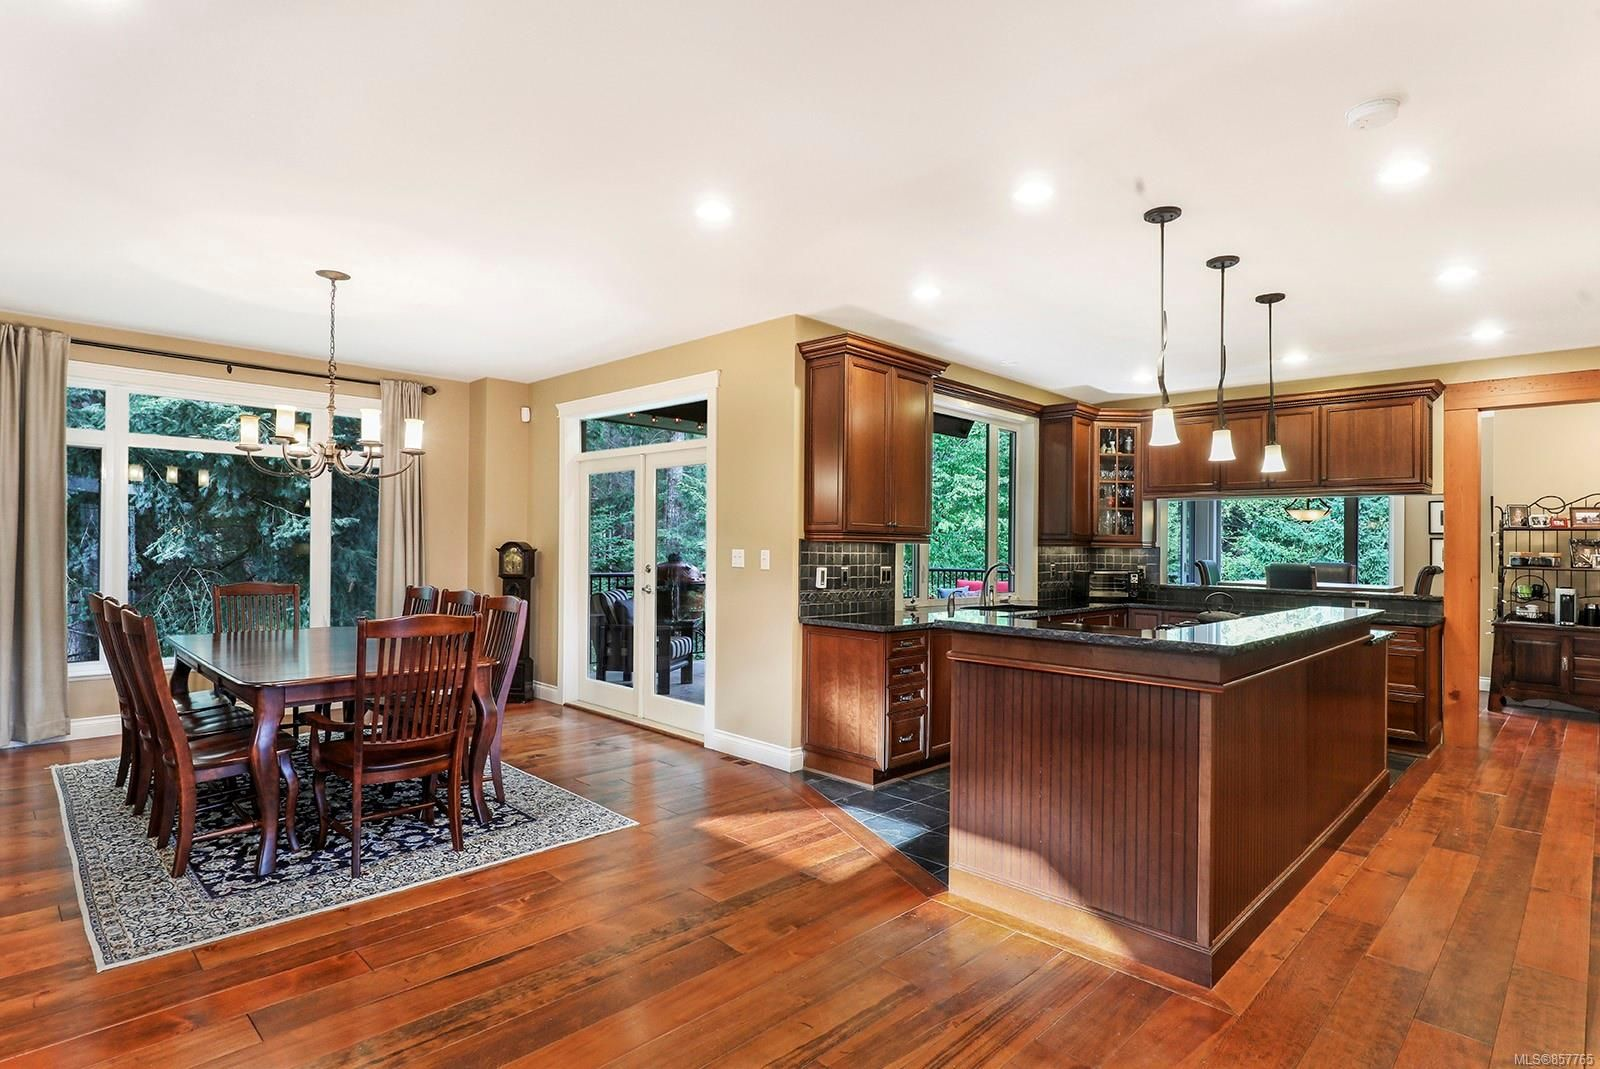 Photo 13: Photos: 1516 Highridge Dr in : CV Comox (Town of) House for sale (Comox Valley)  : MLS®# 857765